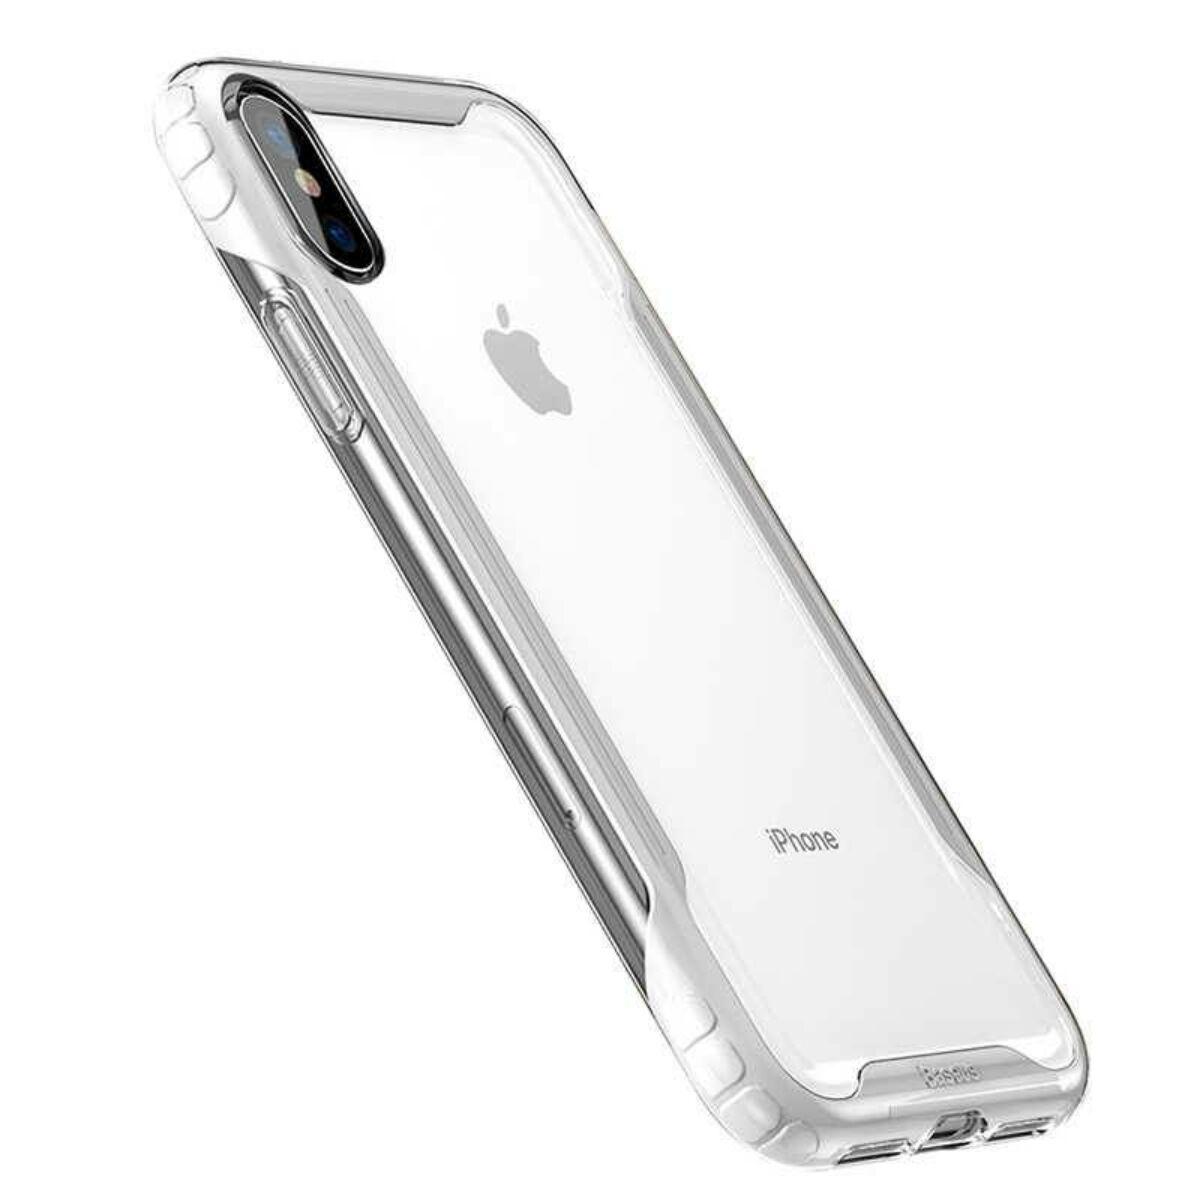 Baseus iPhone XS tok, Armor, fehér (WIAPIPH58-YJ02)